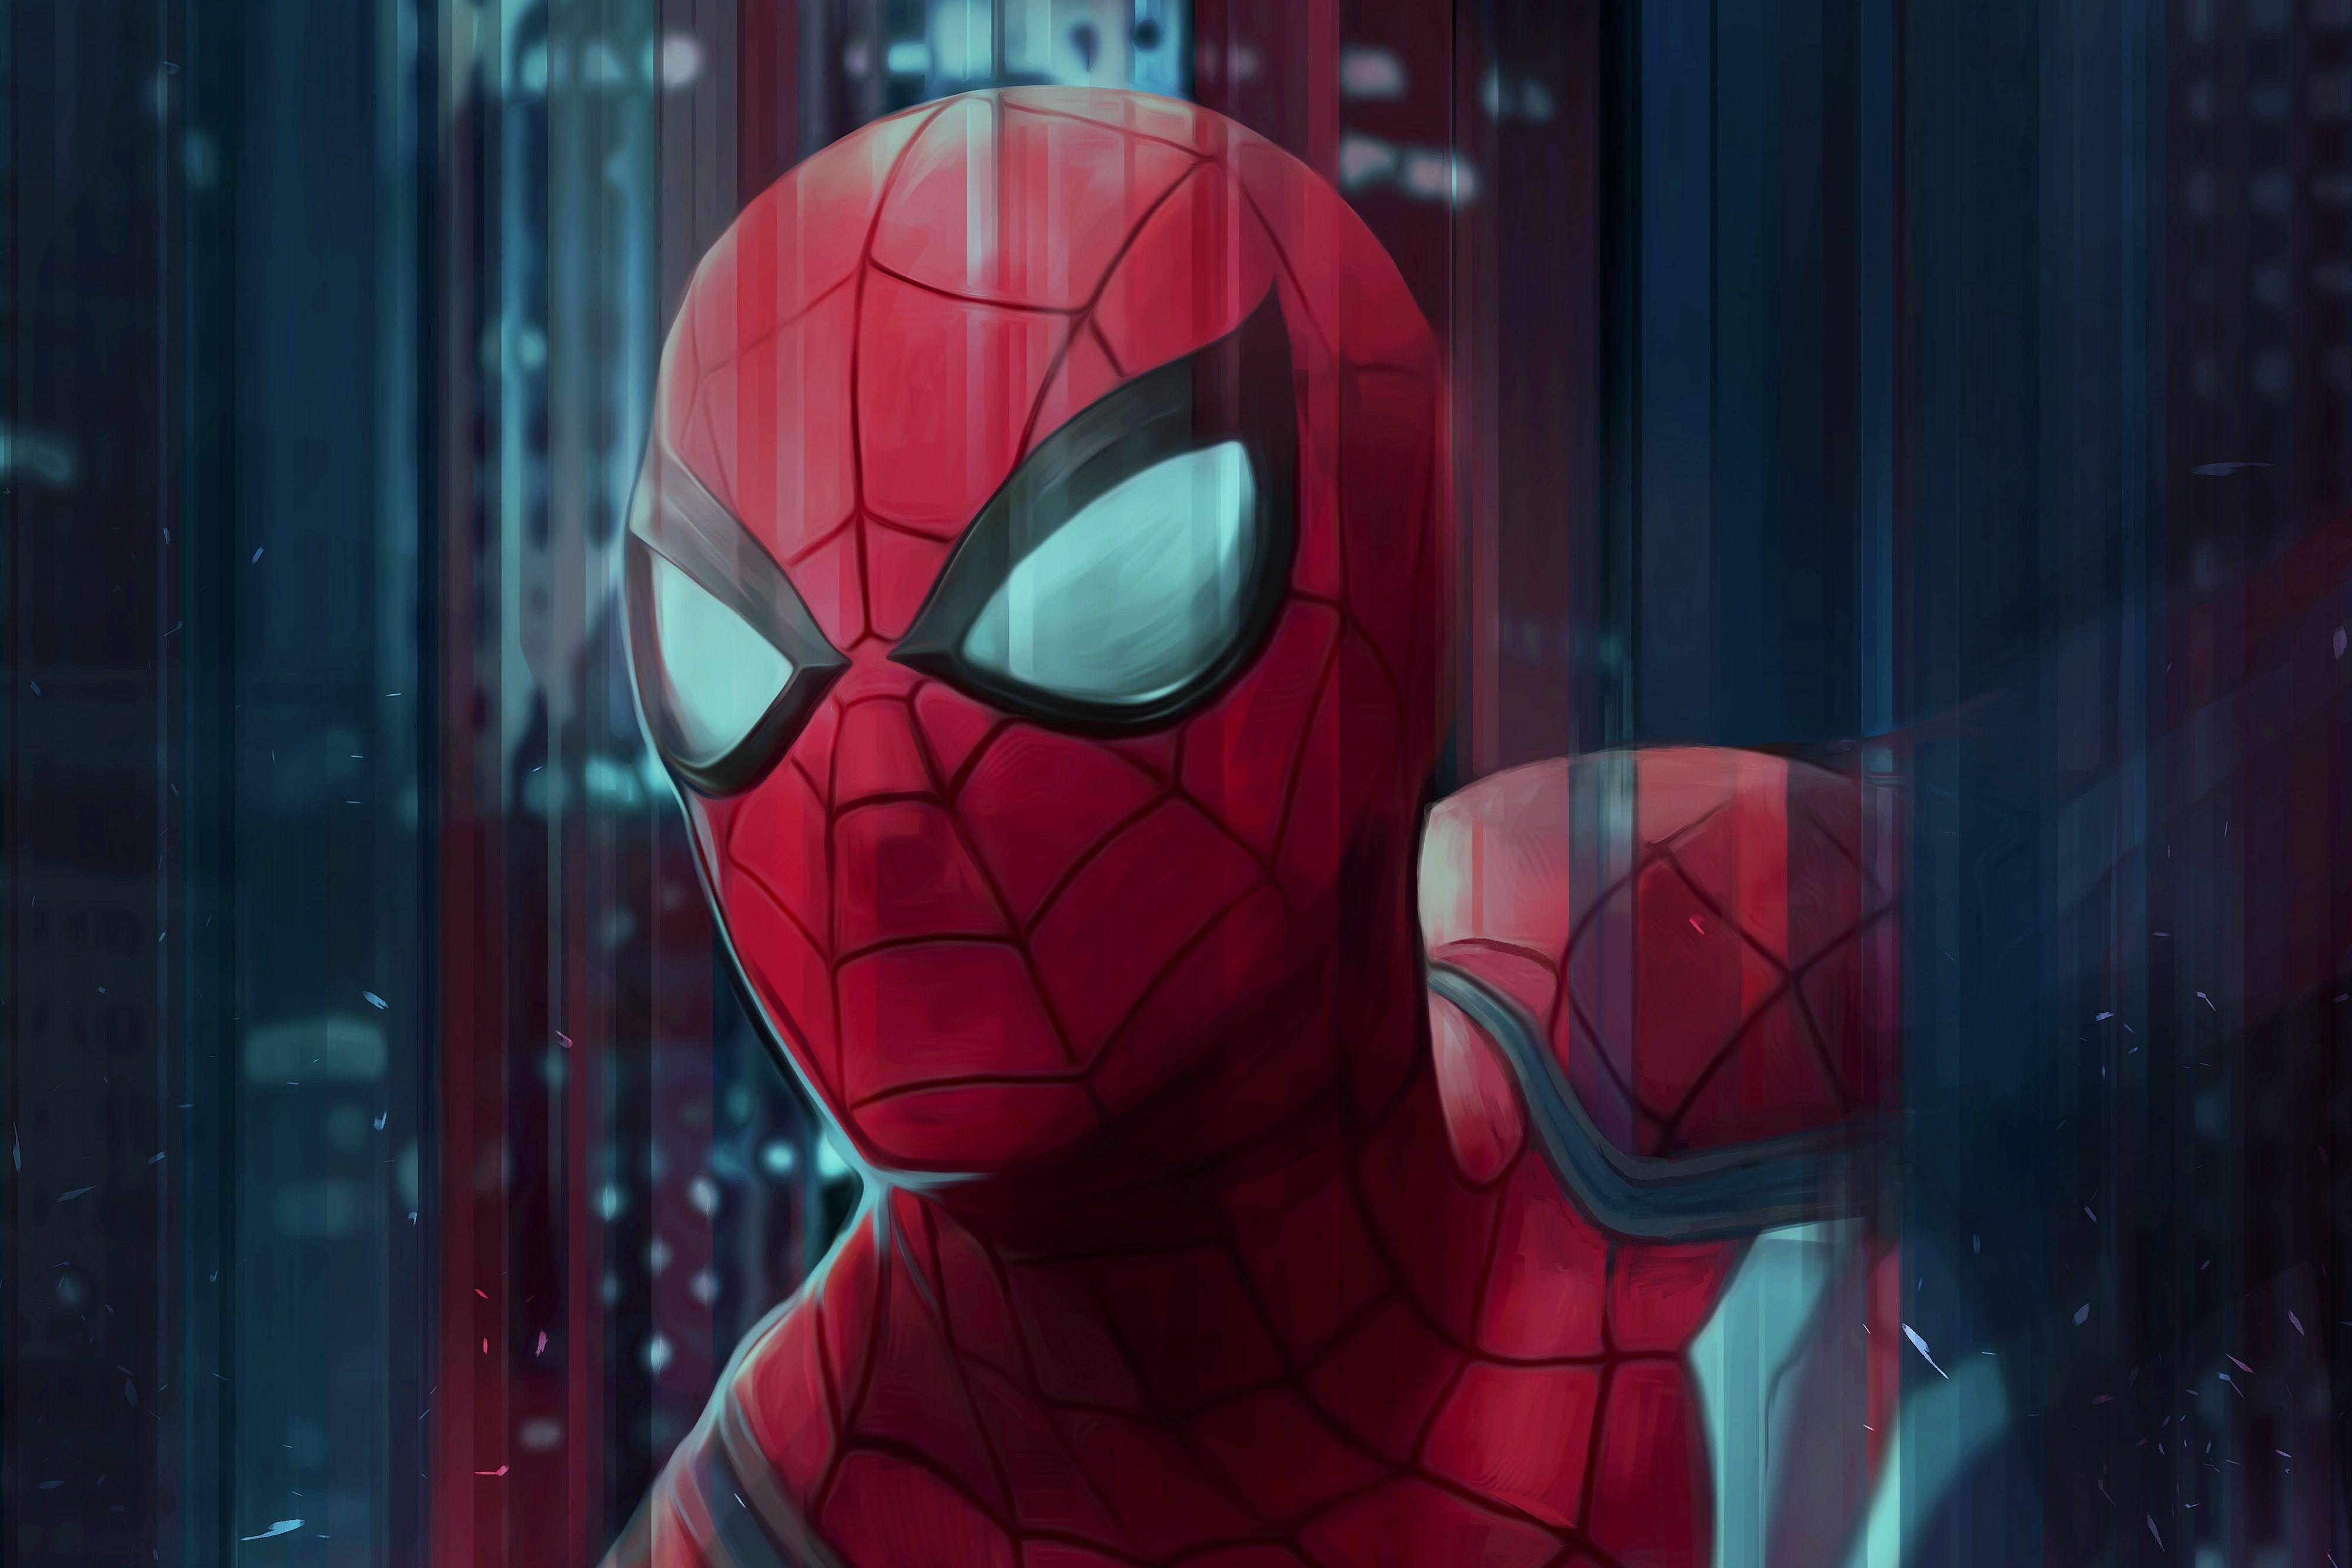 Wallpaper SpiderMan, PS4, HD, 4K, Games, 3125